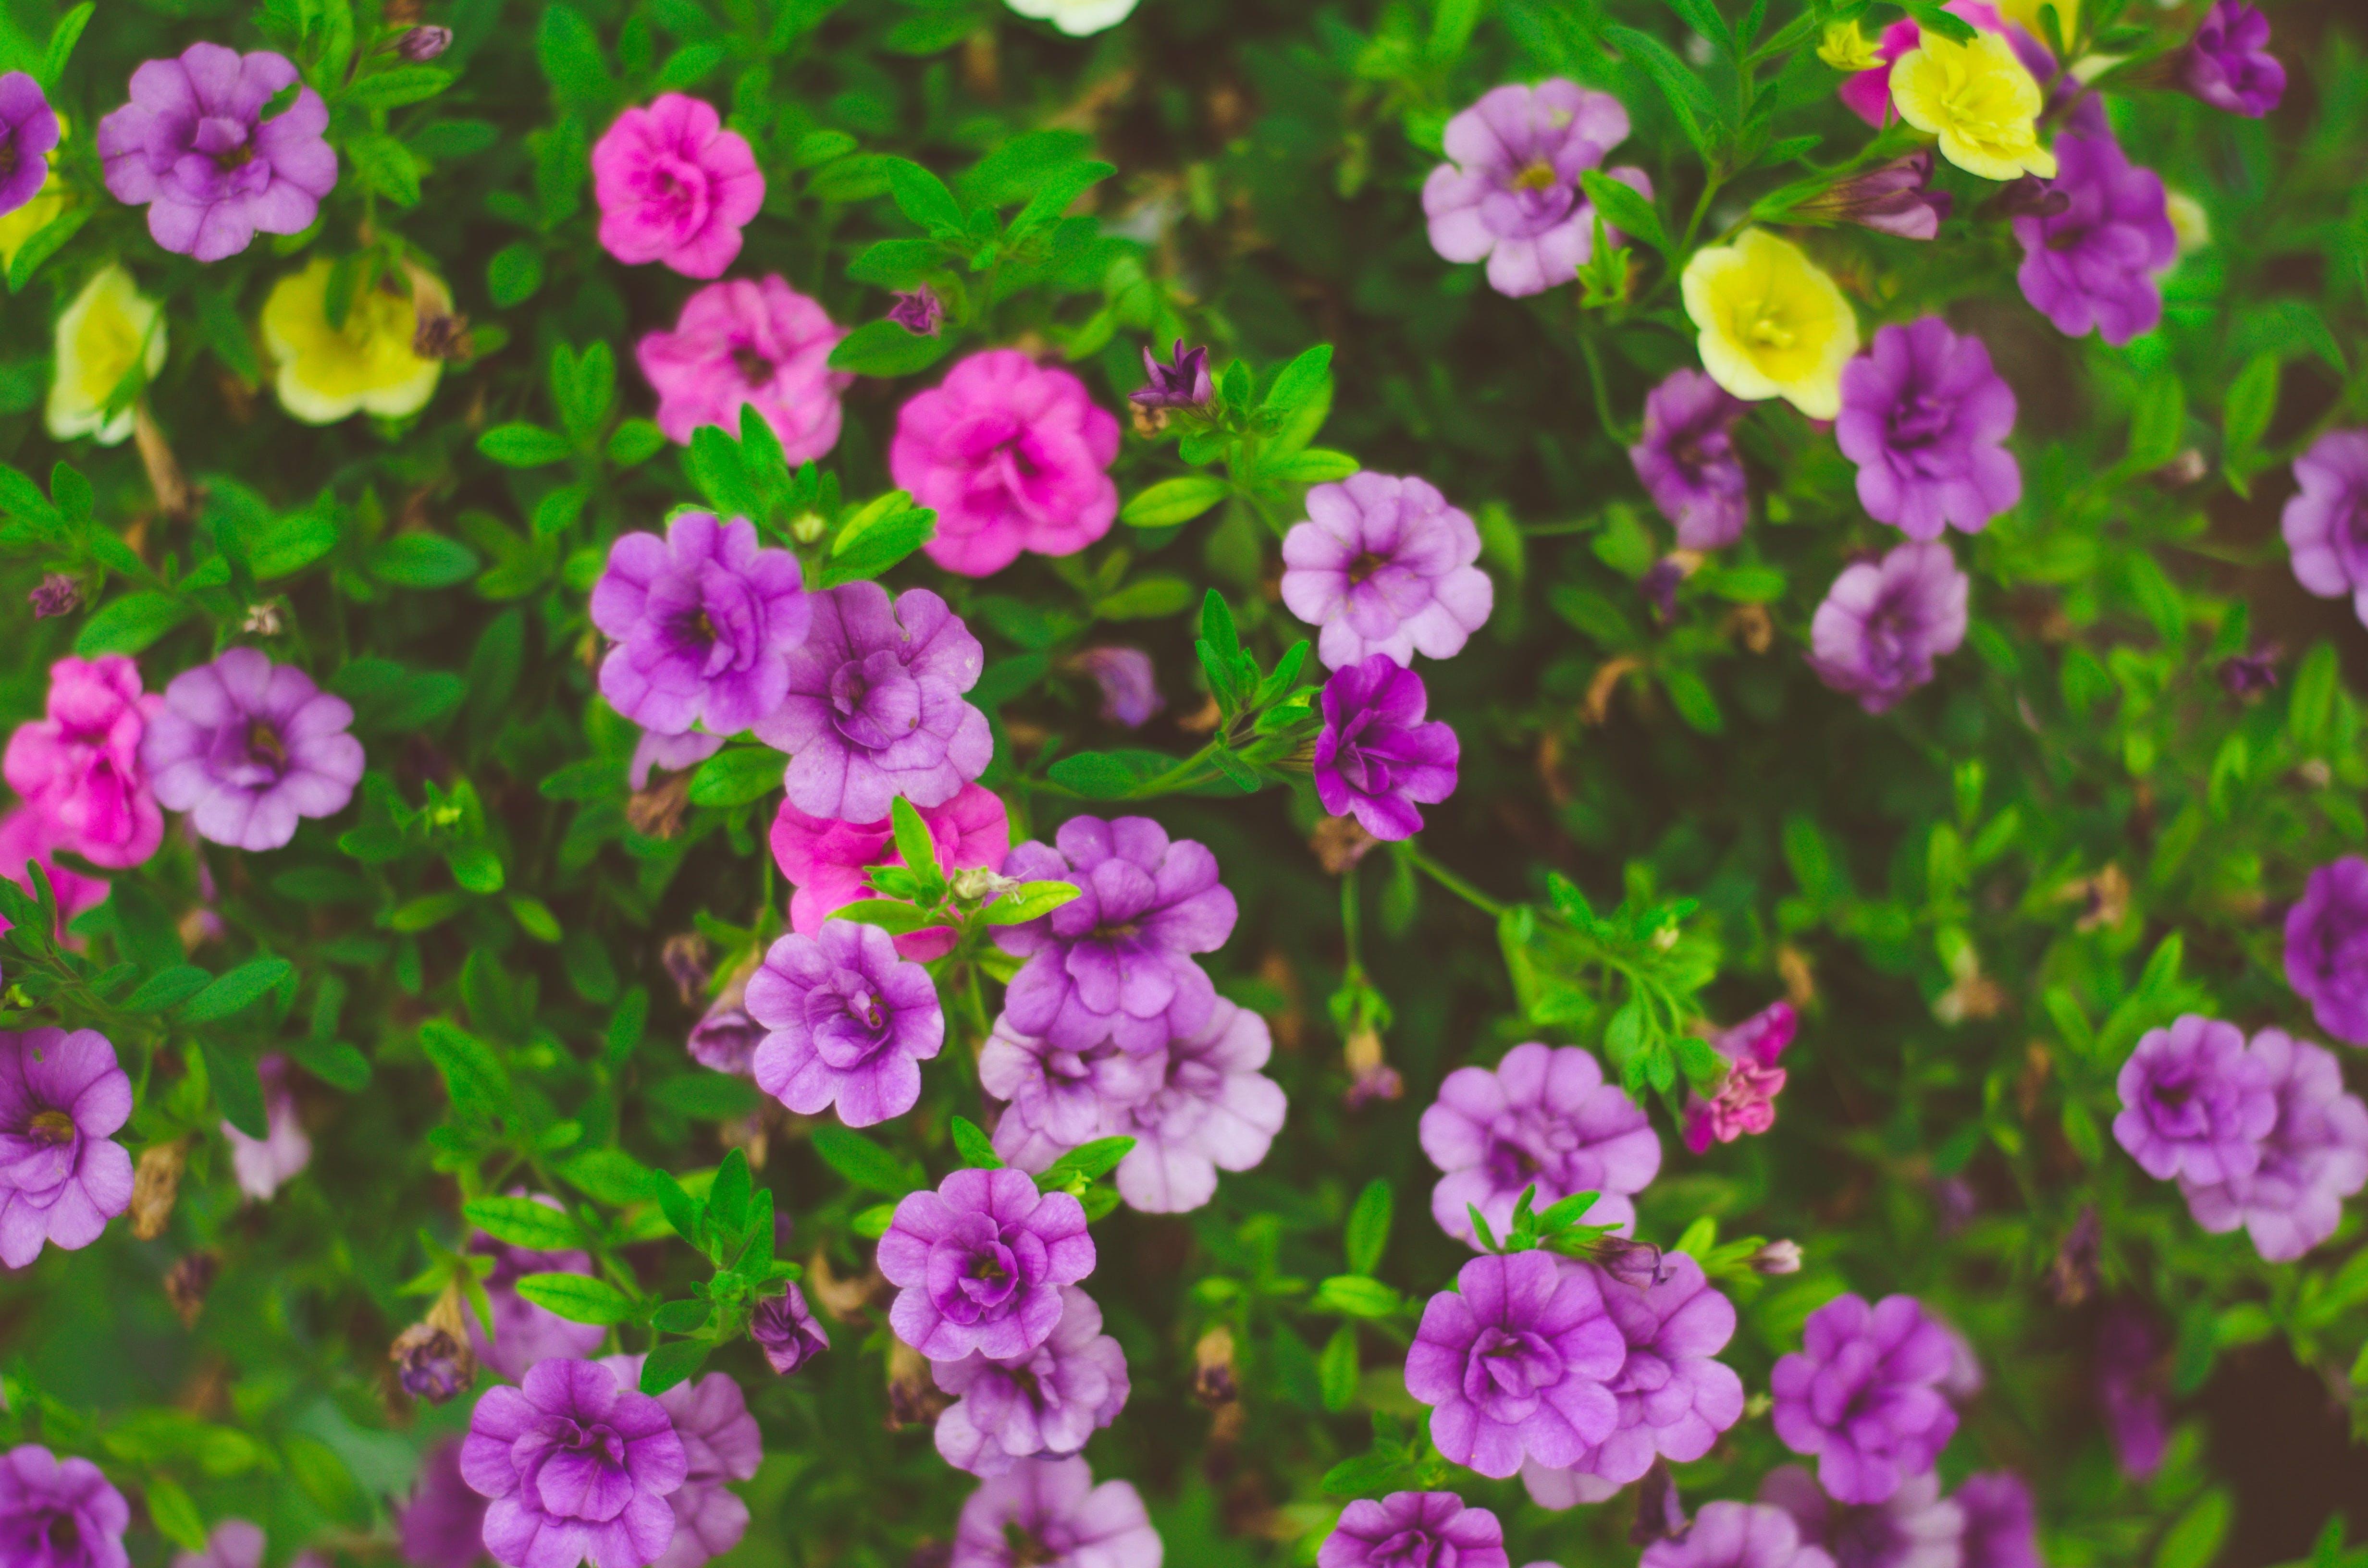 Macro Photo of Purple Flowers